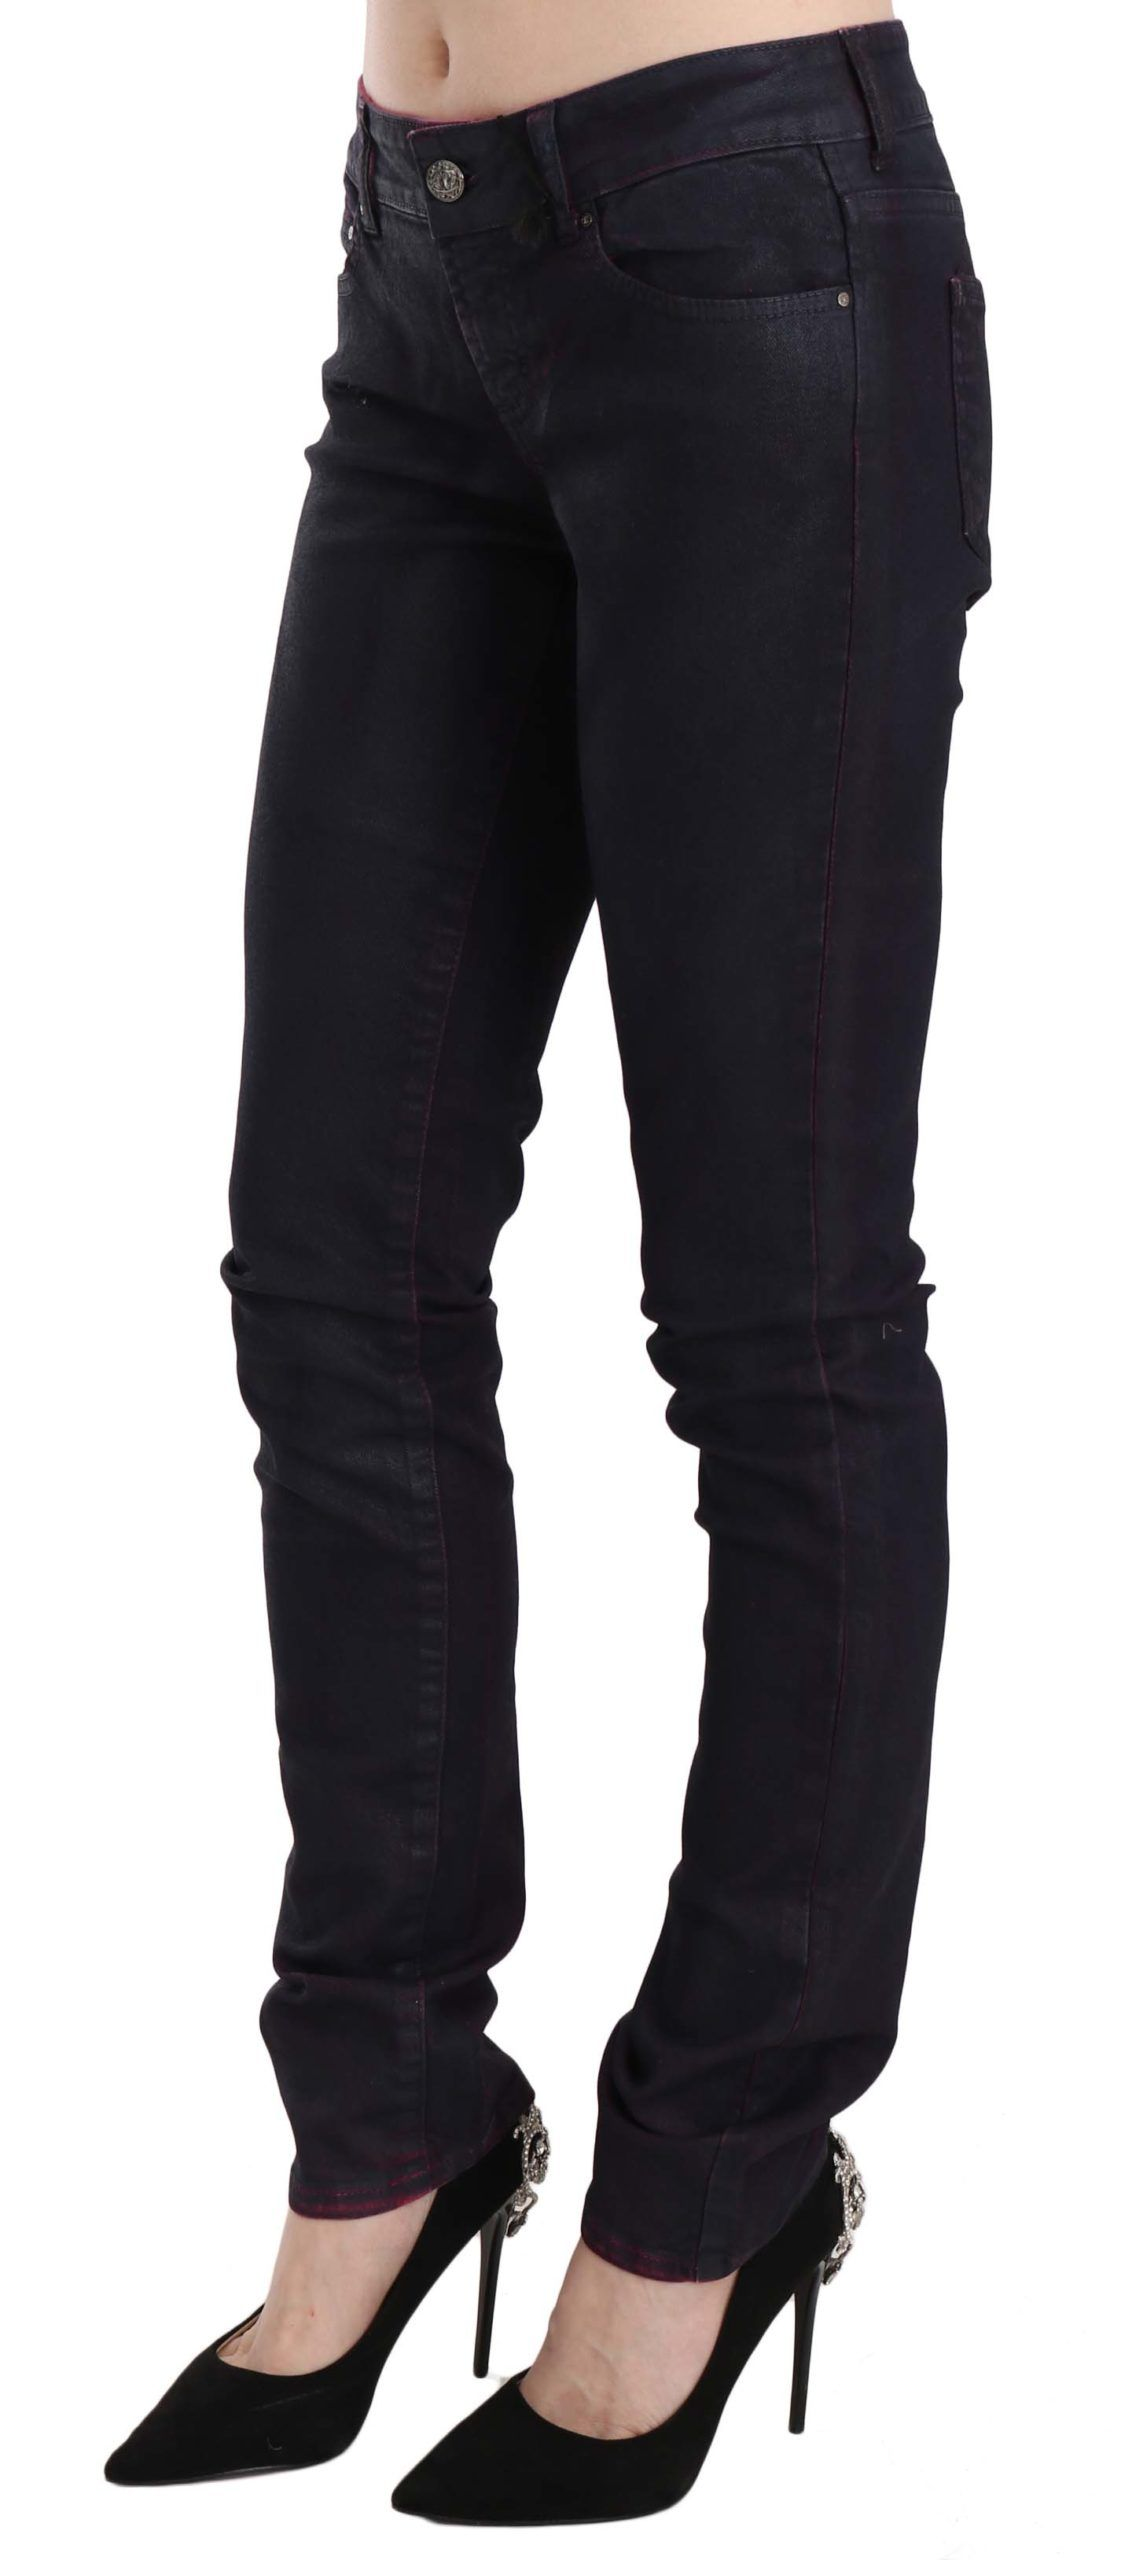 Just Cavalli Black Cotton Low Waist Skinny Denim Pants